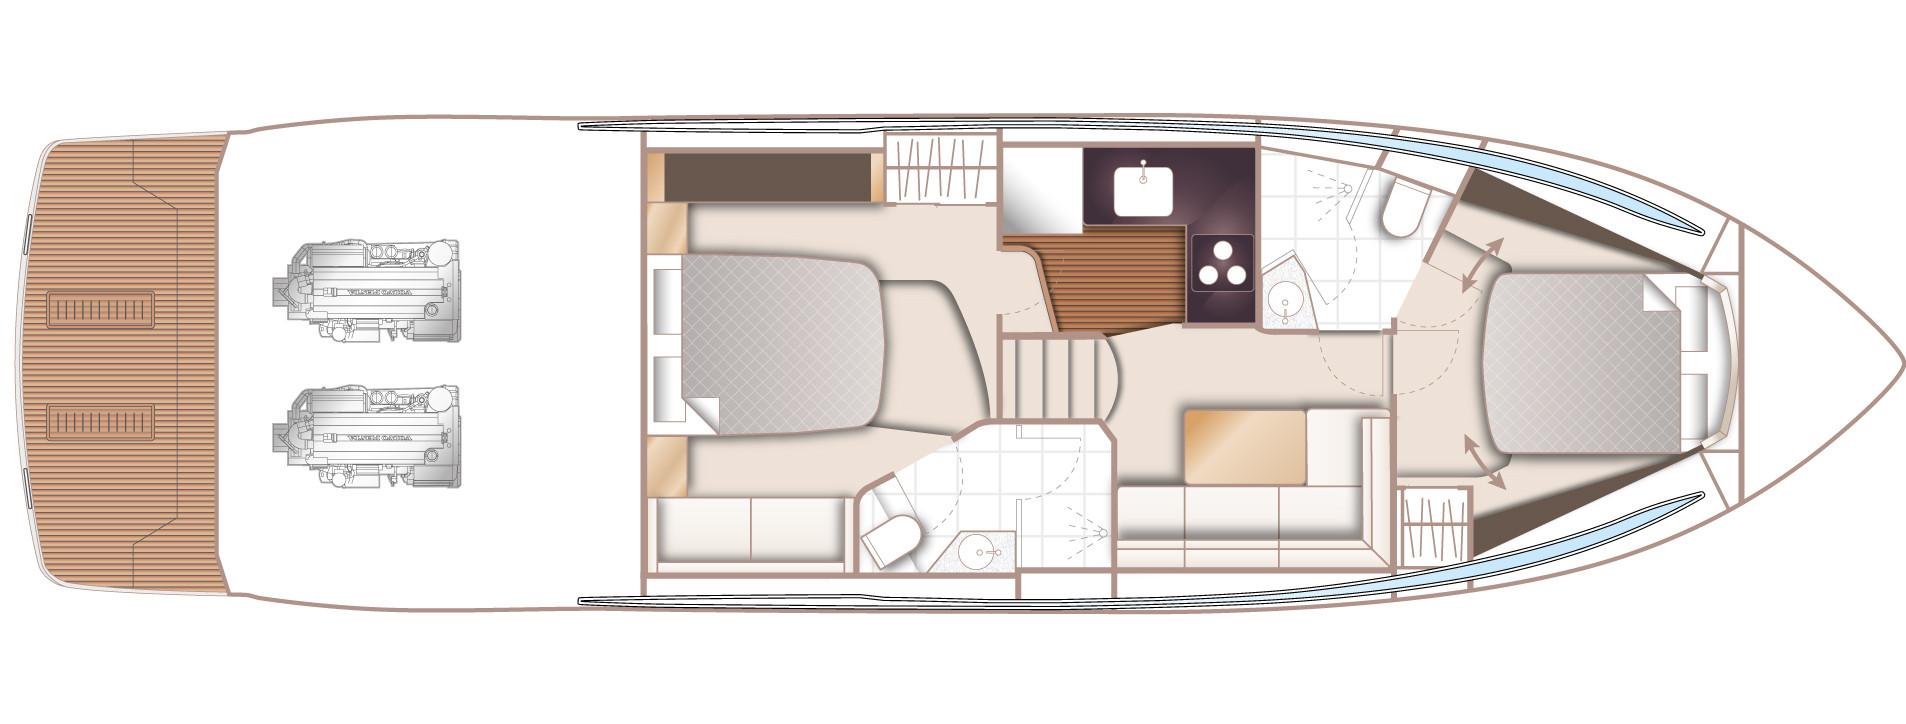 v50-layout-lower-deck.jpg